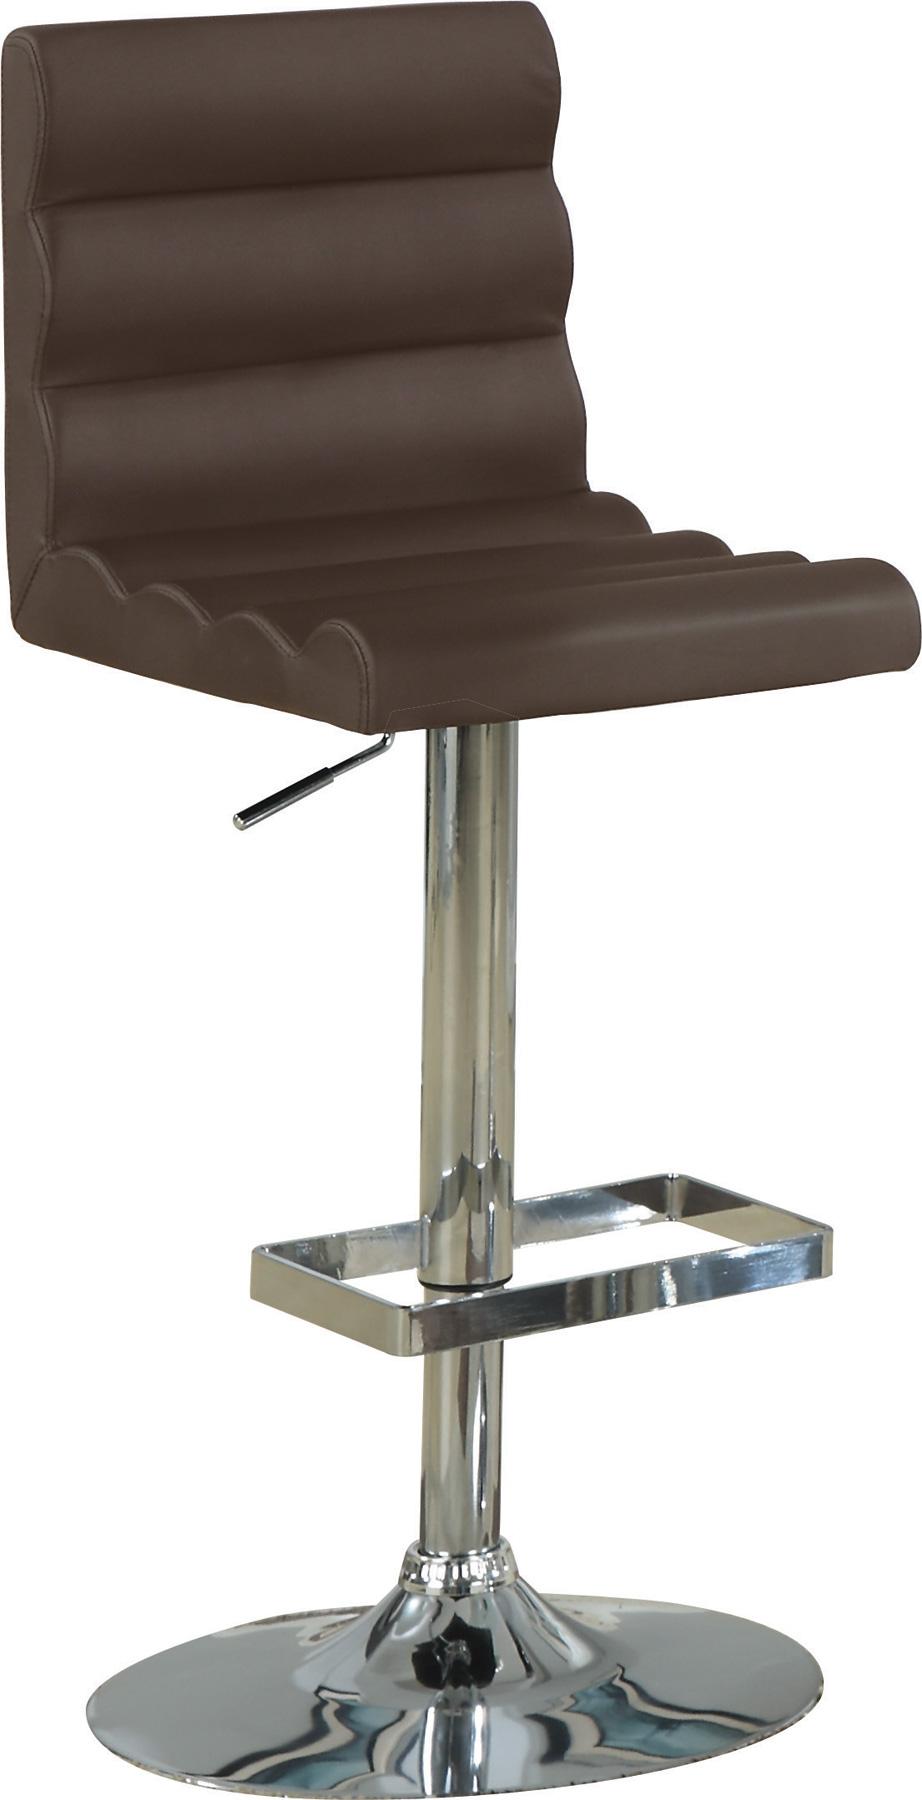 2 Coaster Furniture Brown Metal Adjustable Bar Stools